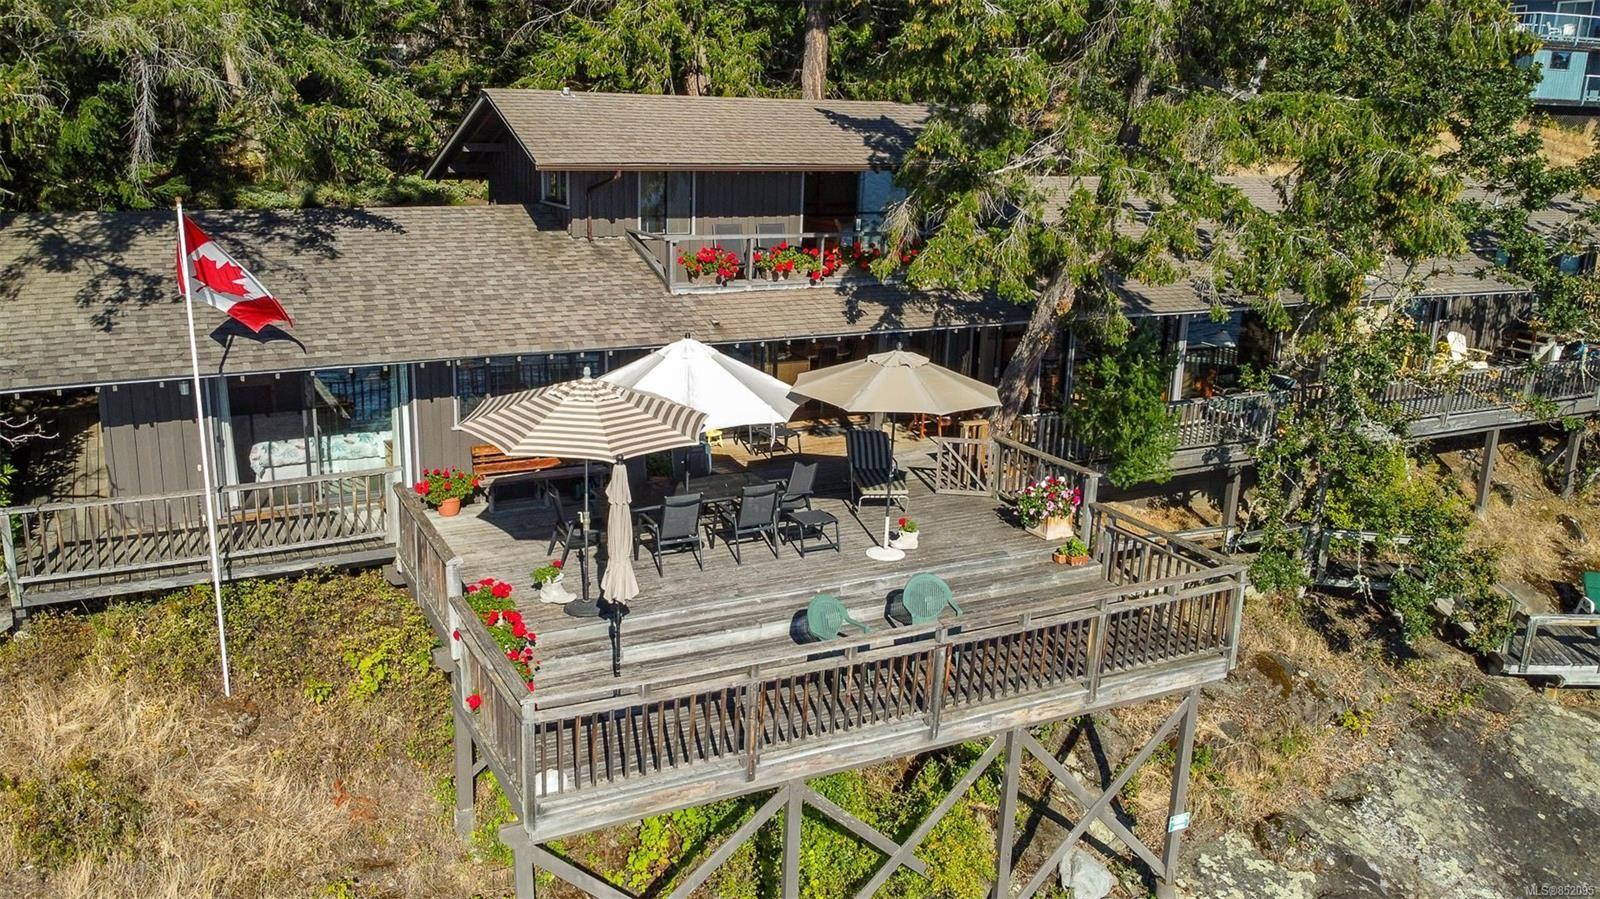 Photo 37: Photos: 236 McGill Rd in : GI Salt Spring House for sale (Gulf Islands)  : MLS®# 852095